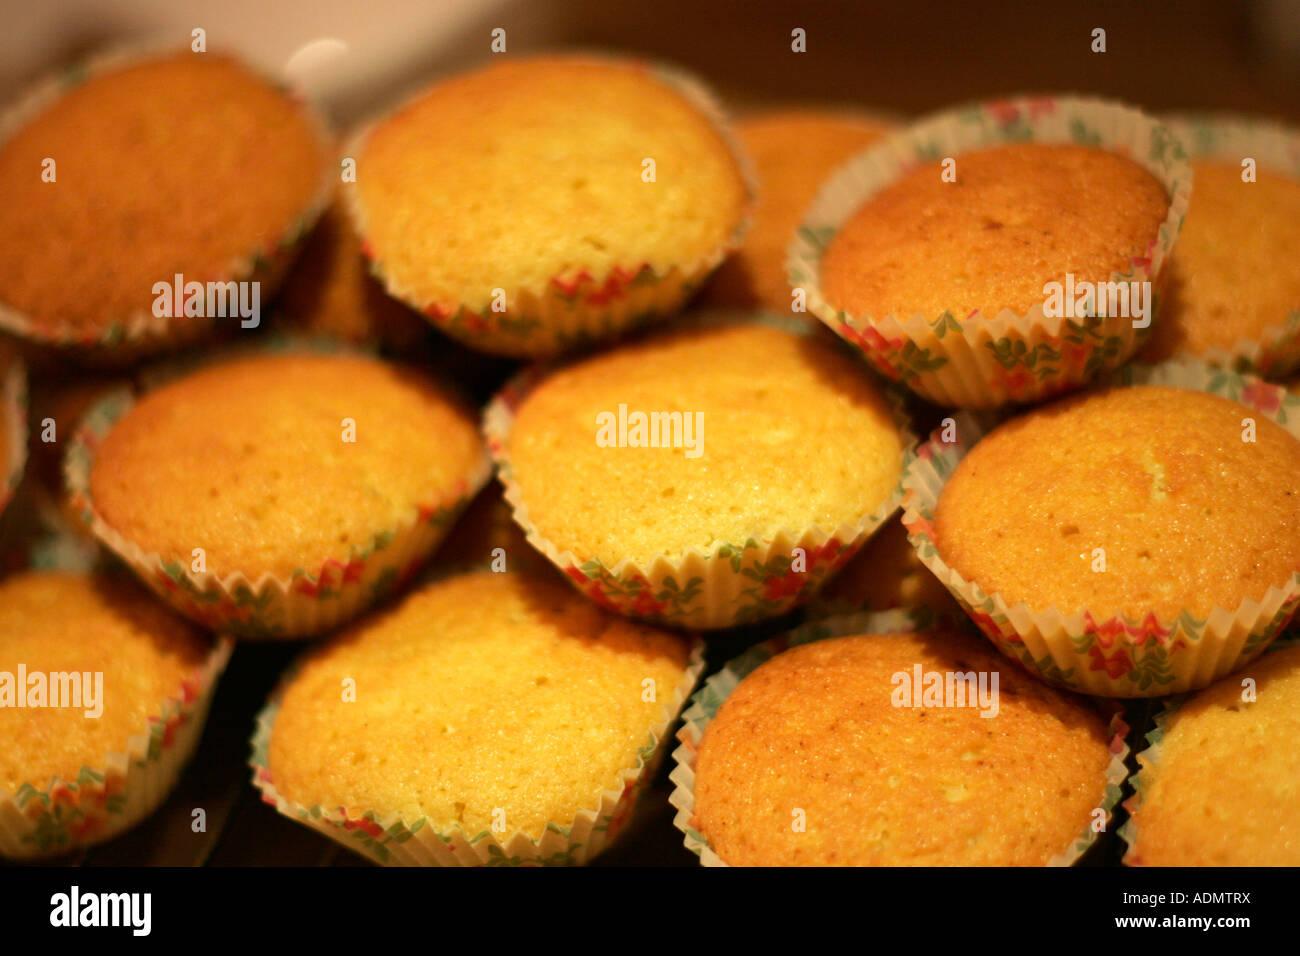 Fairy Cakes - Stock Image